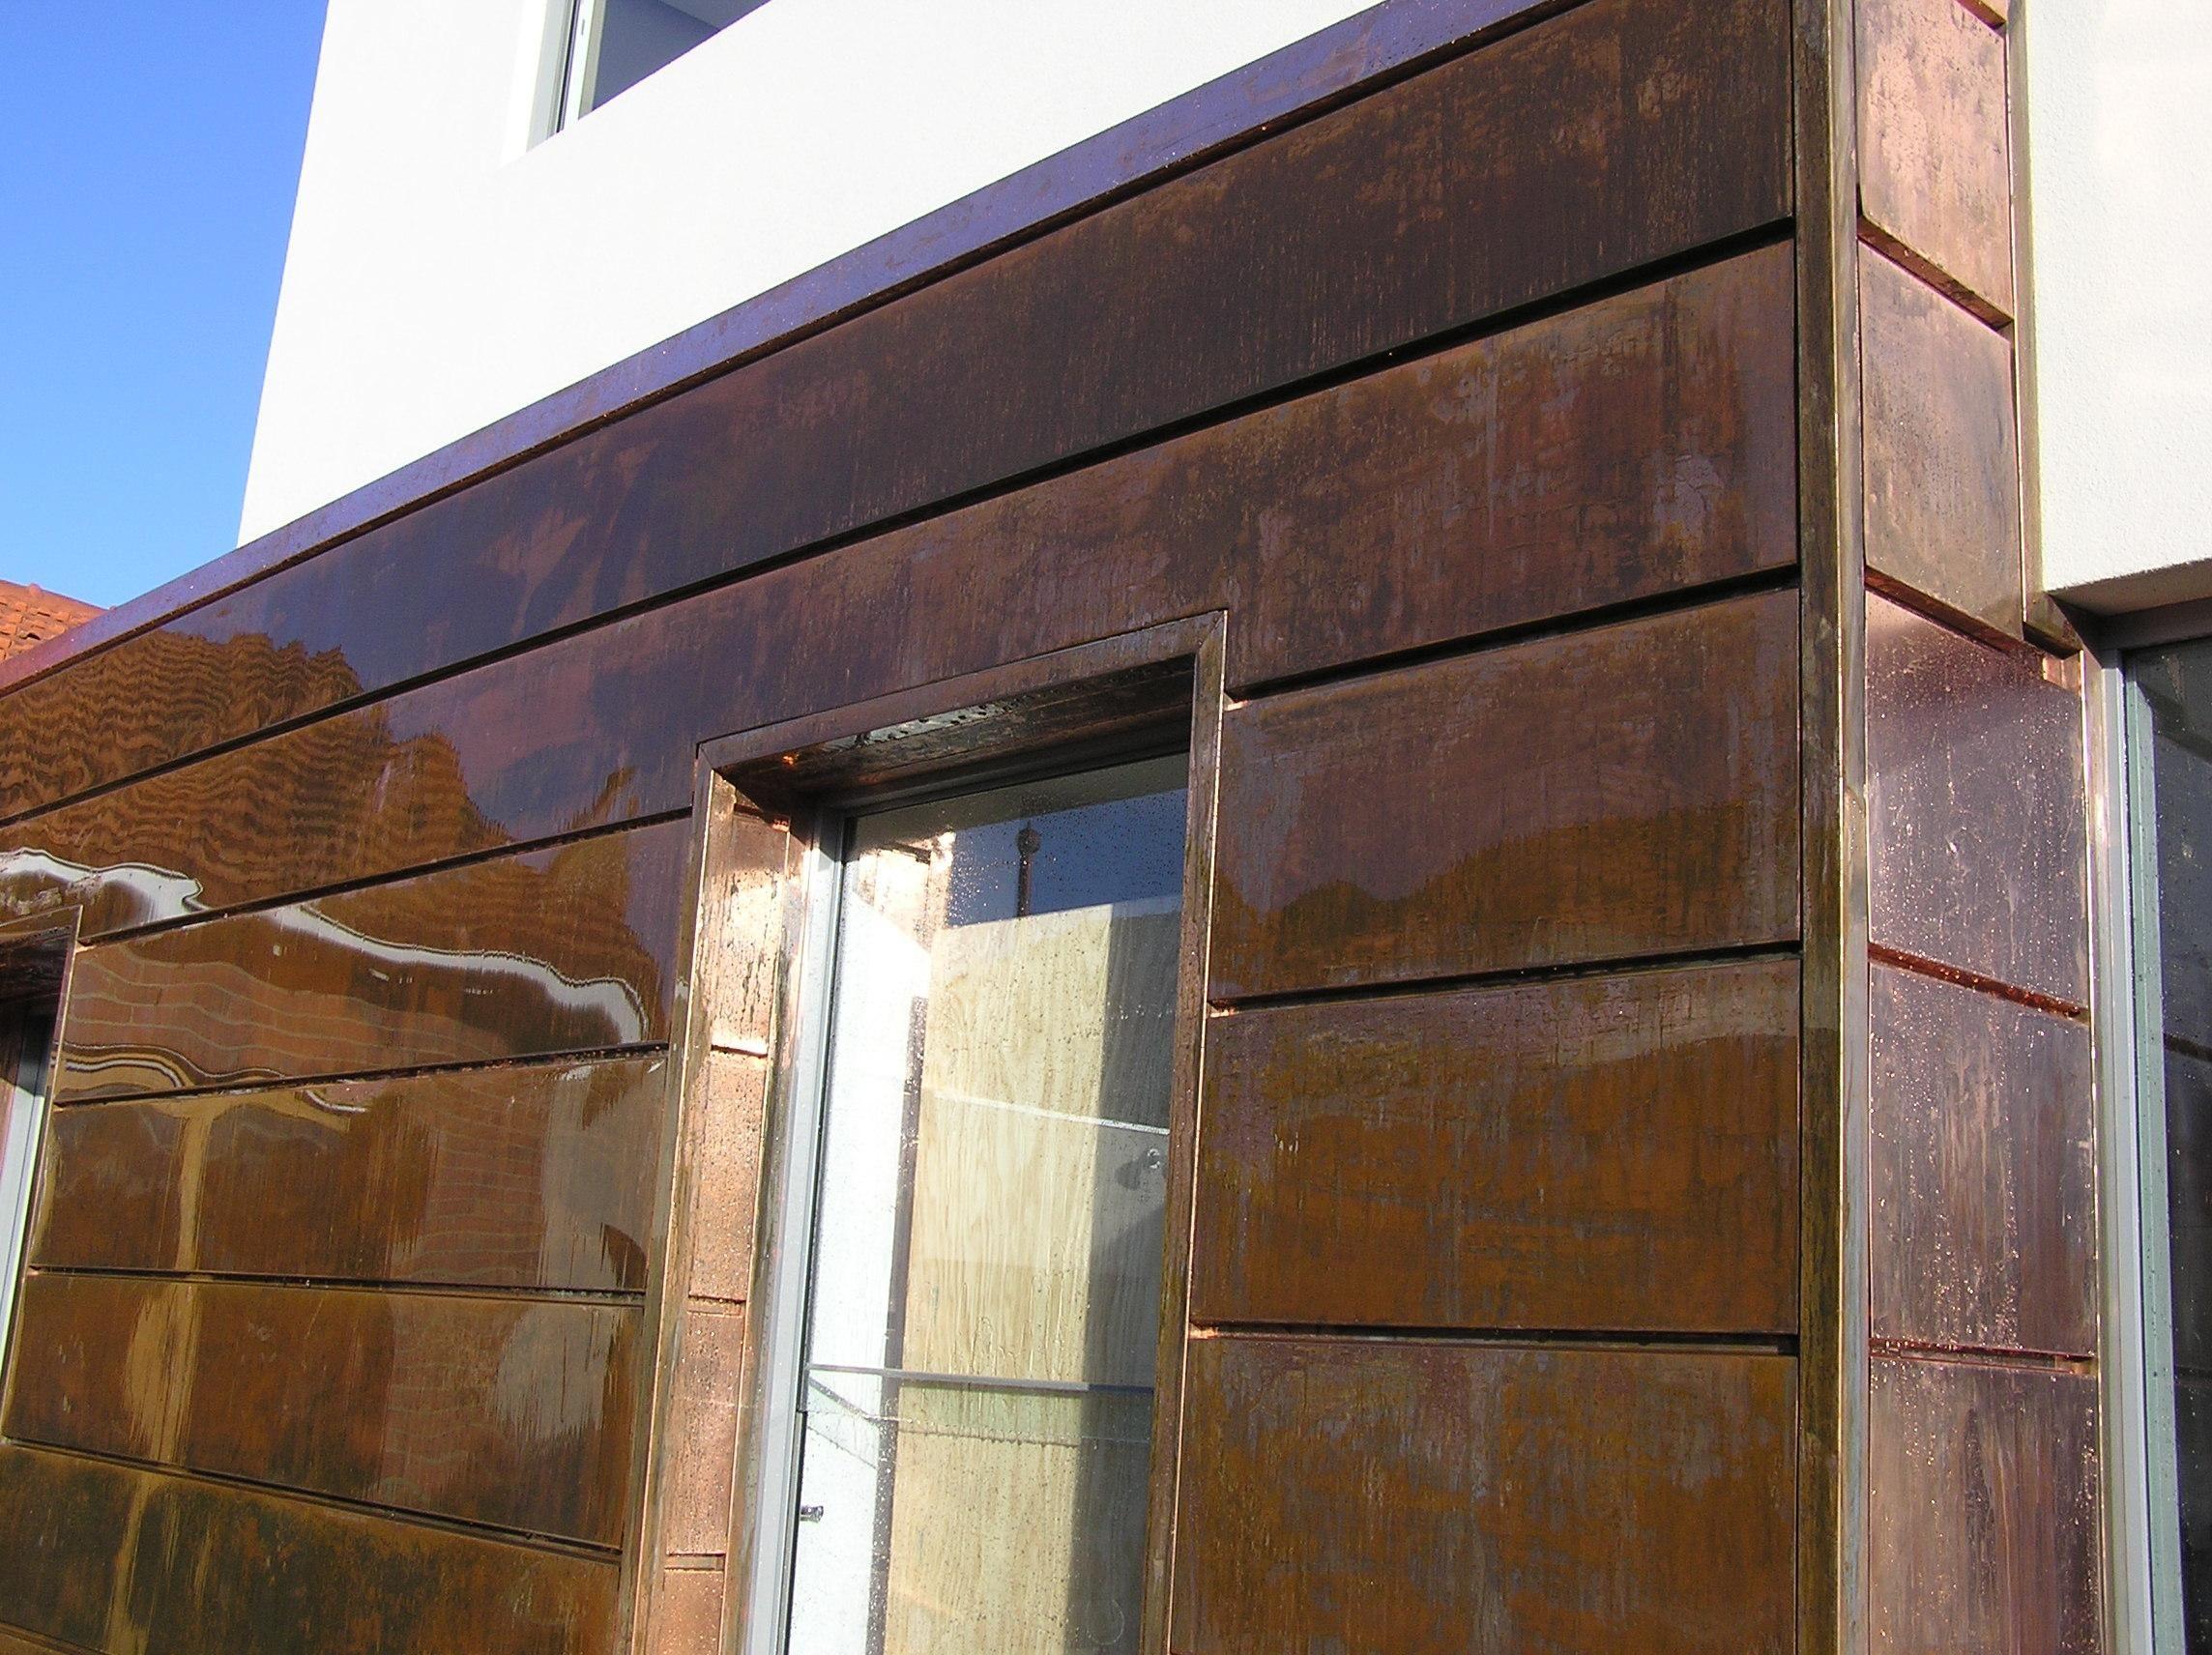 copper panel images - Google Search | shutters | Pinterest ...